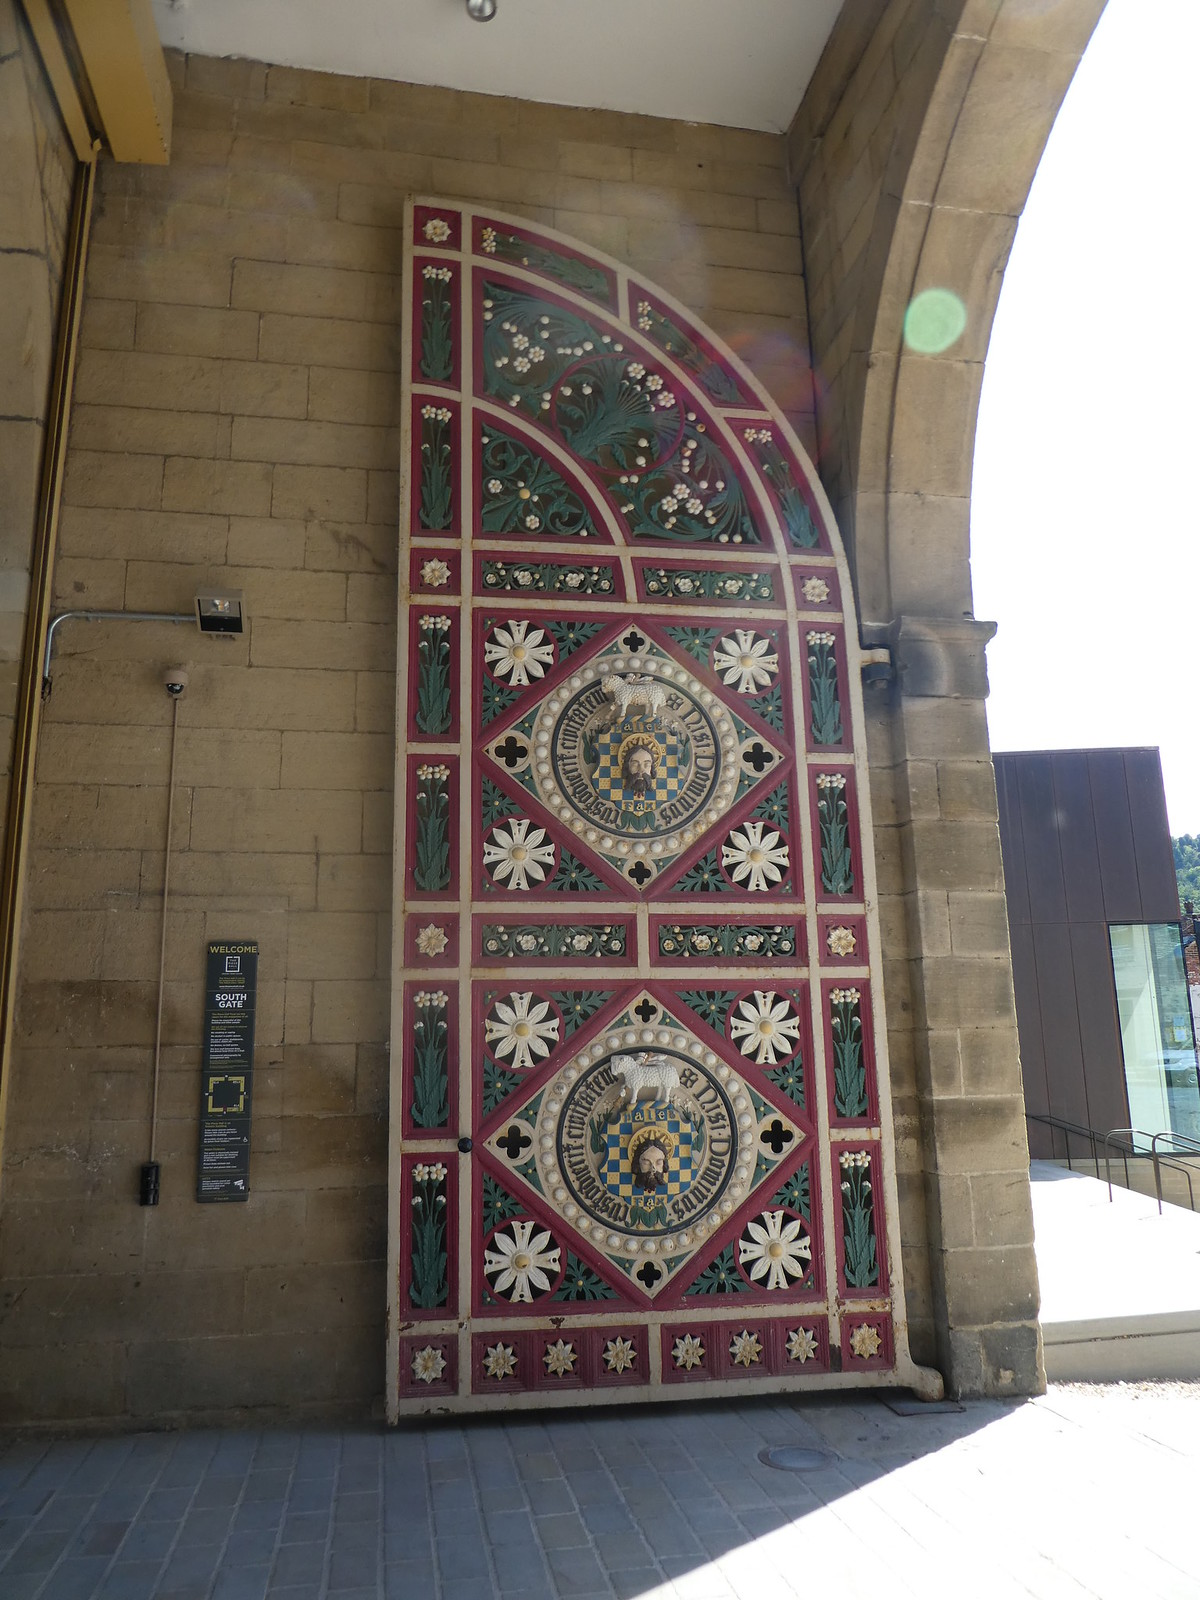 South Gate, Piece Hall, Halifax